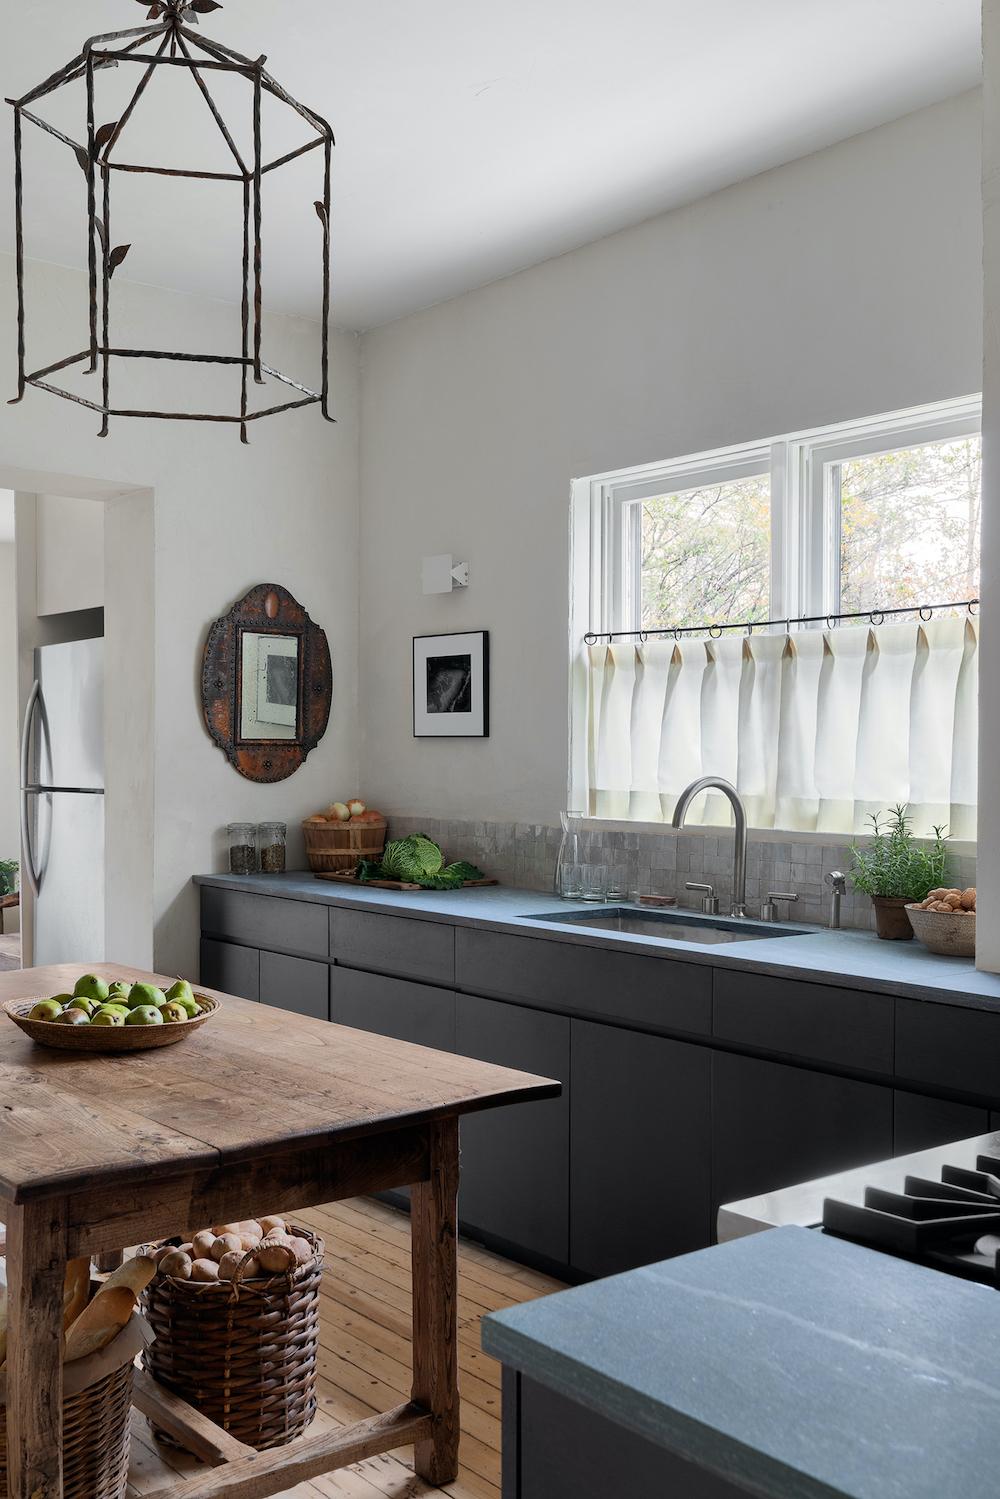 kingston design showhouse kitchen